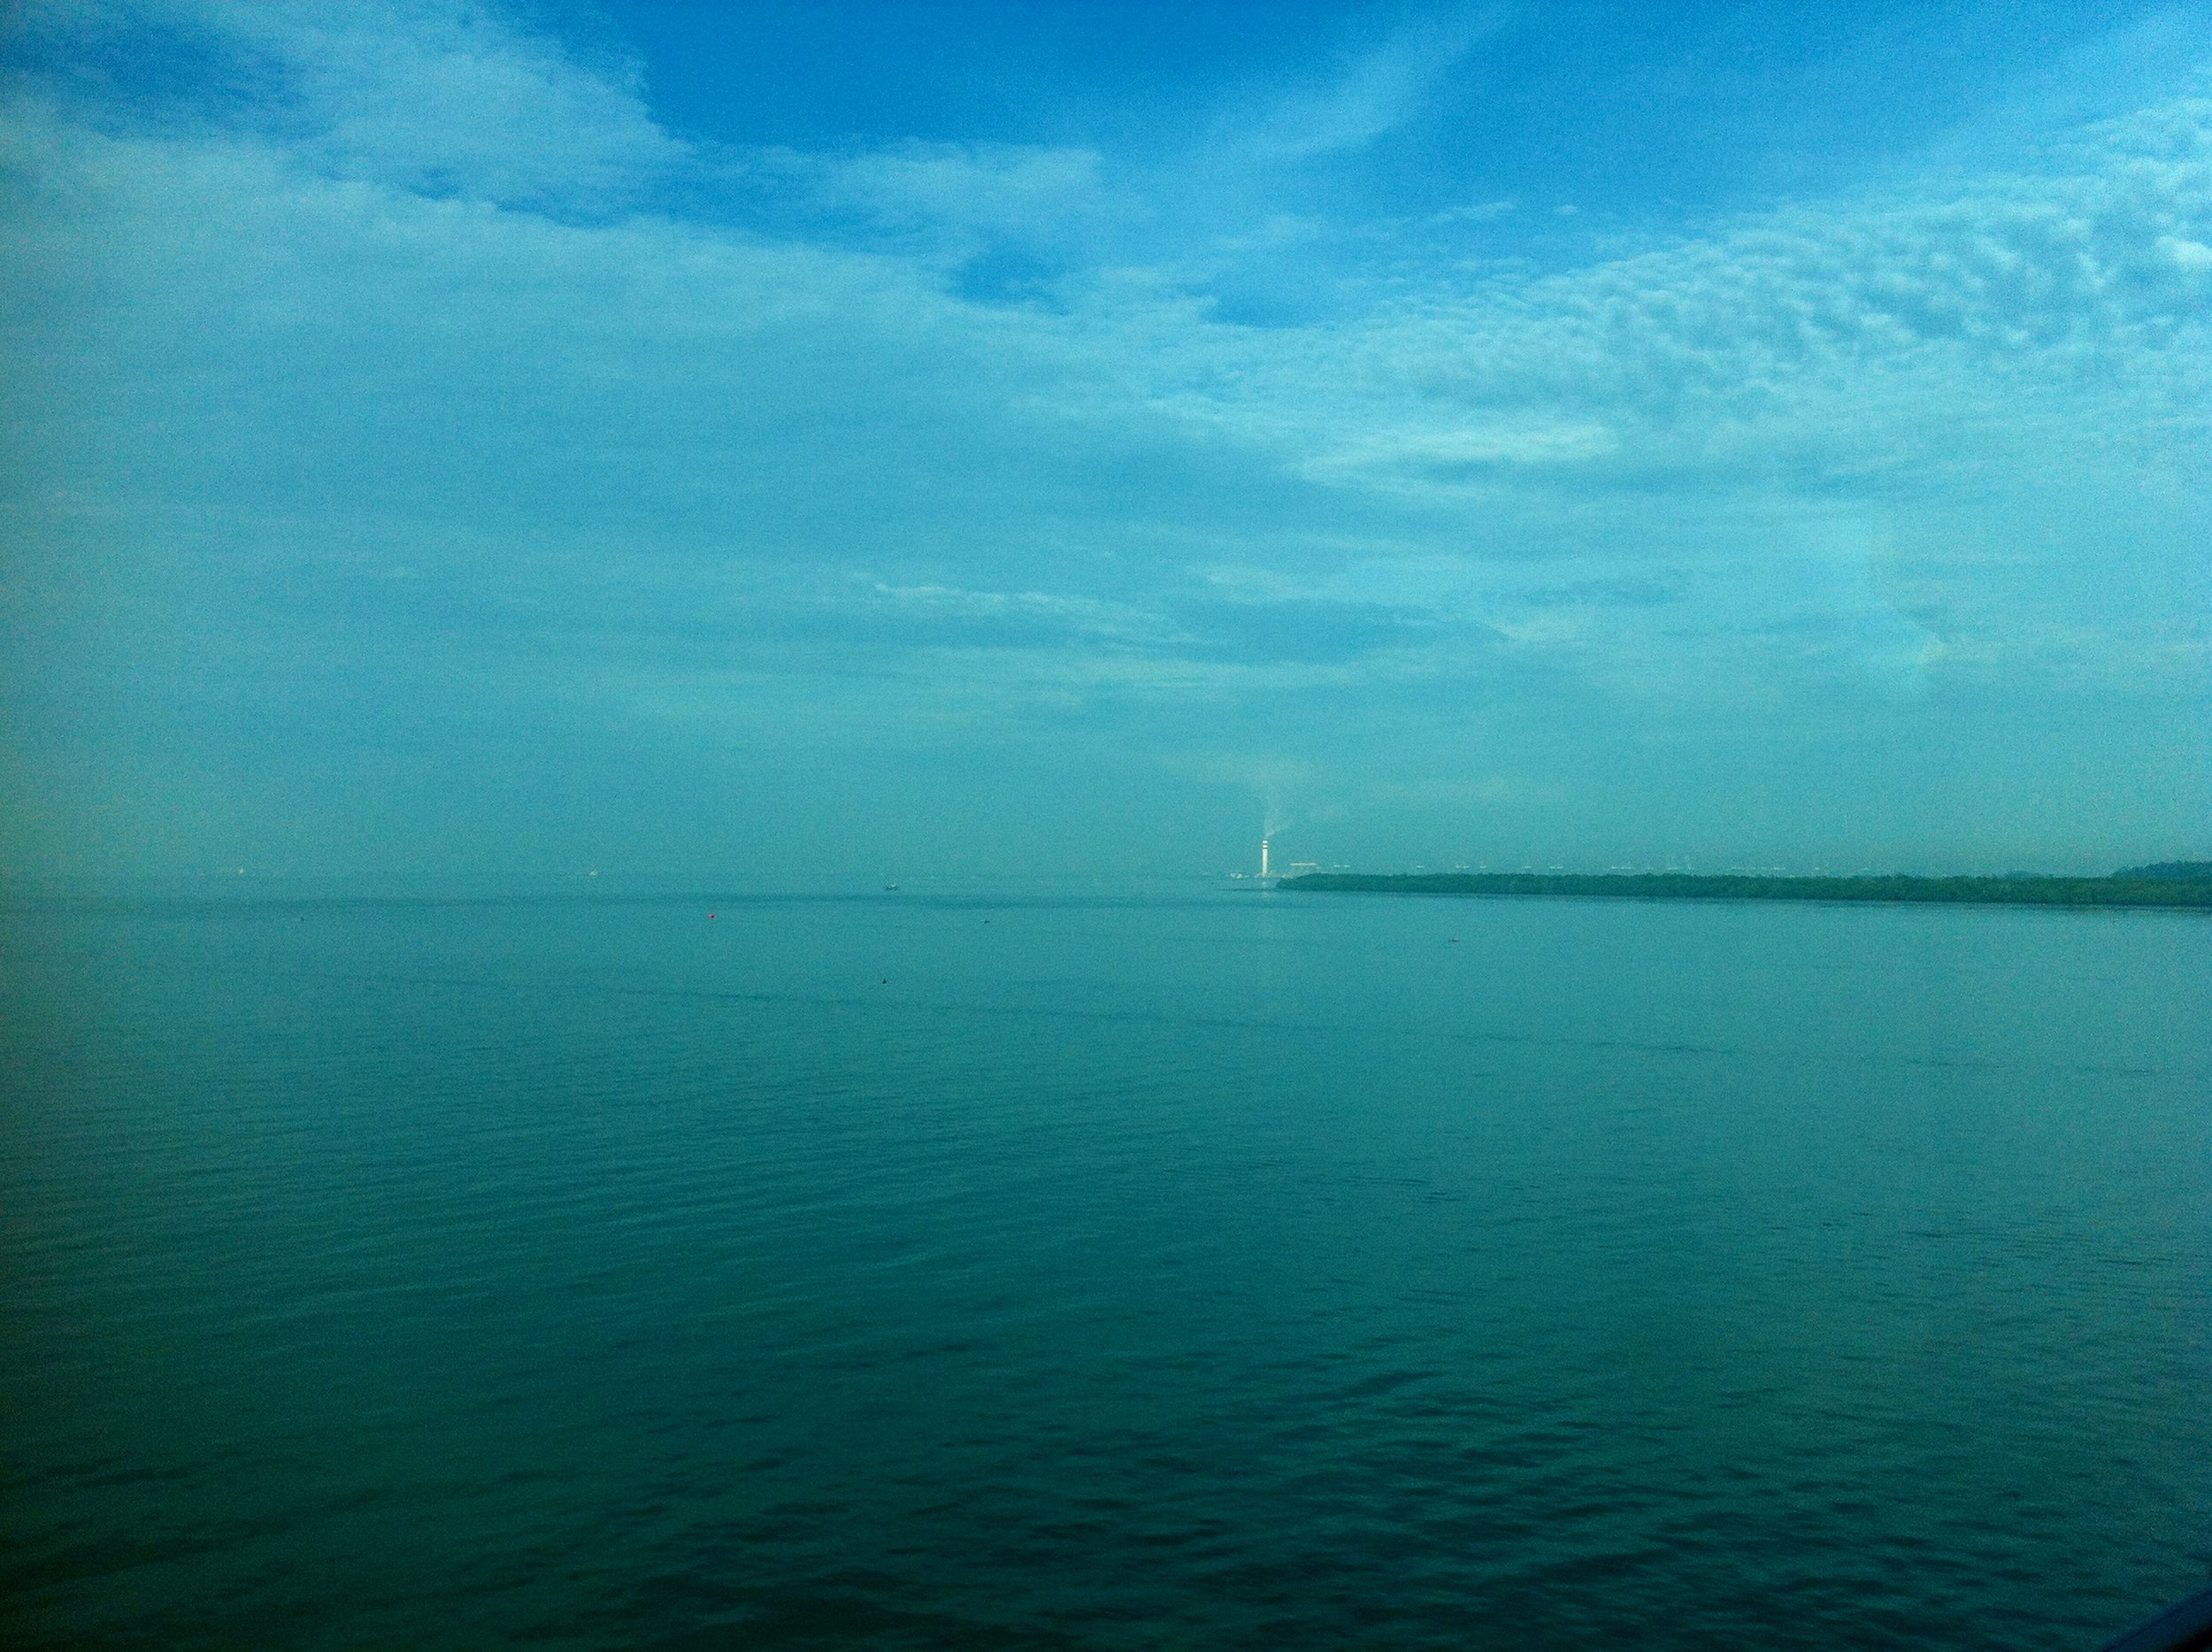 The Johor Strait separating Singapore and Malaysia. Photo: (C) Remko Tanis